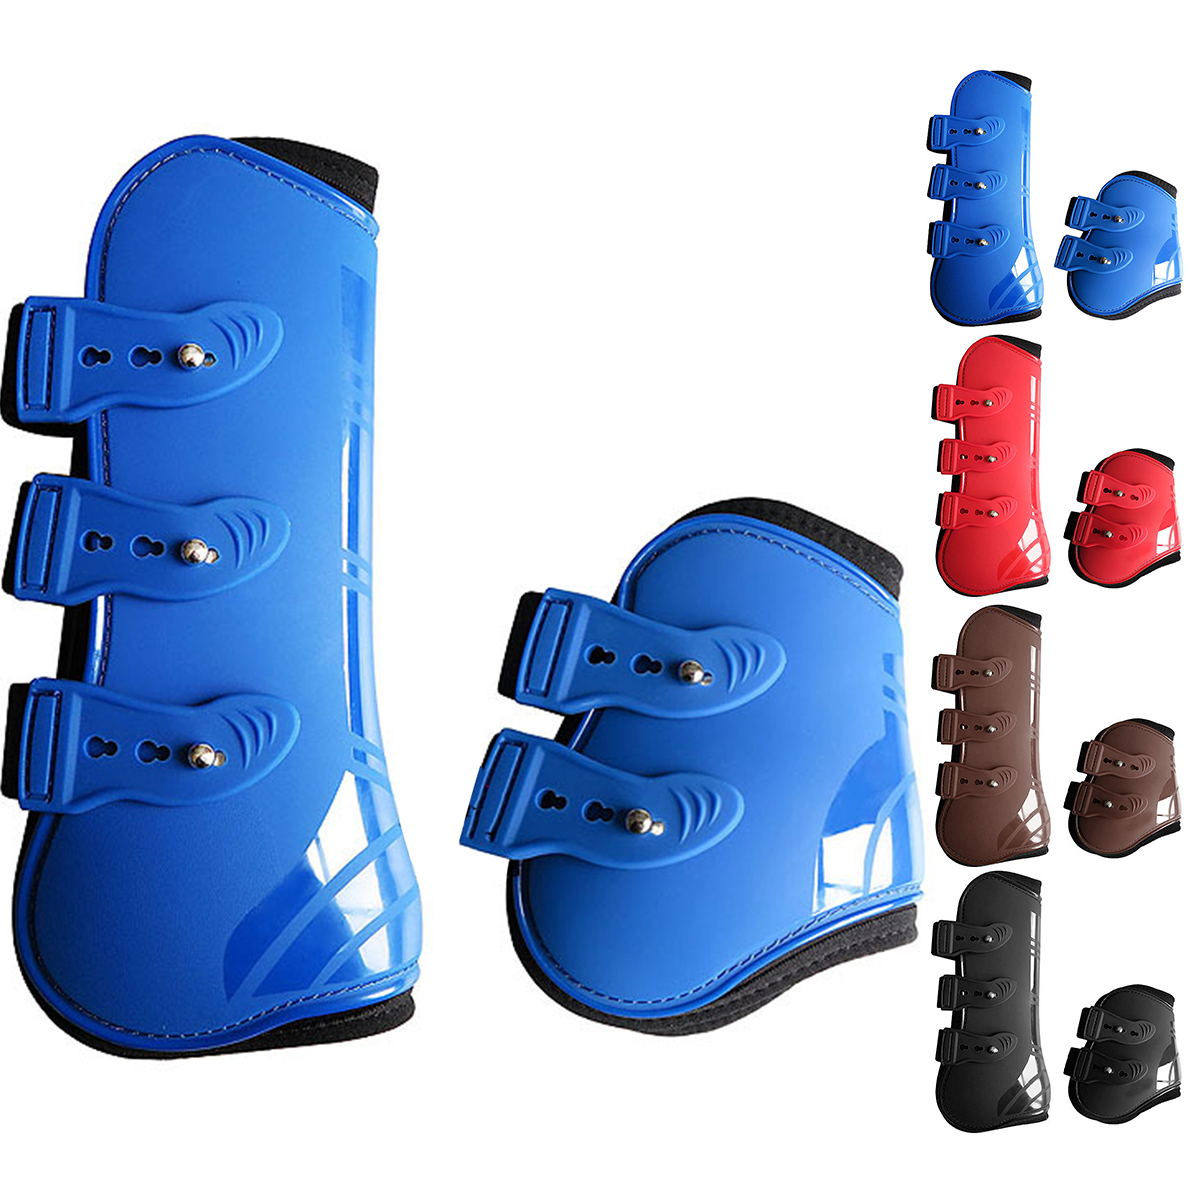 4pcs Practical Front Hind Brace Protection Wrap Farm Horse Leg Boots Adjustable Training Guard Durable Equestrian Outdoor Riding